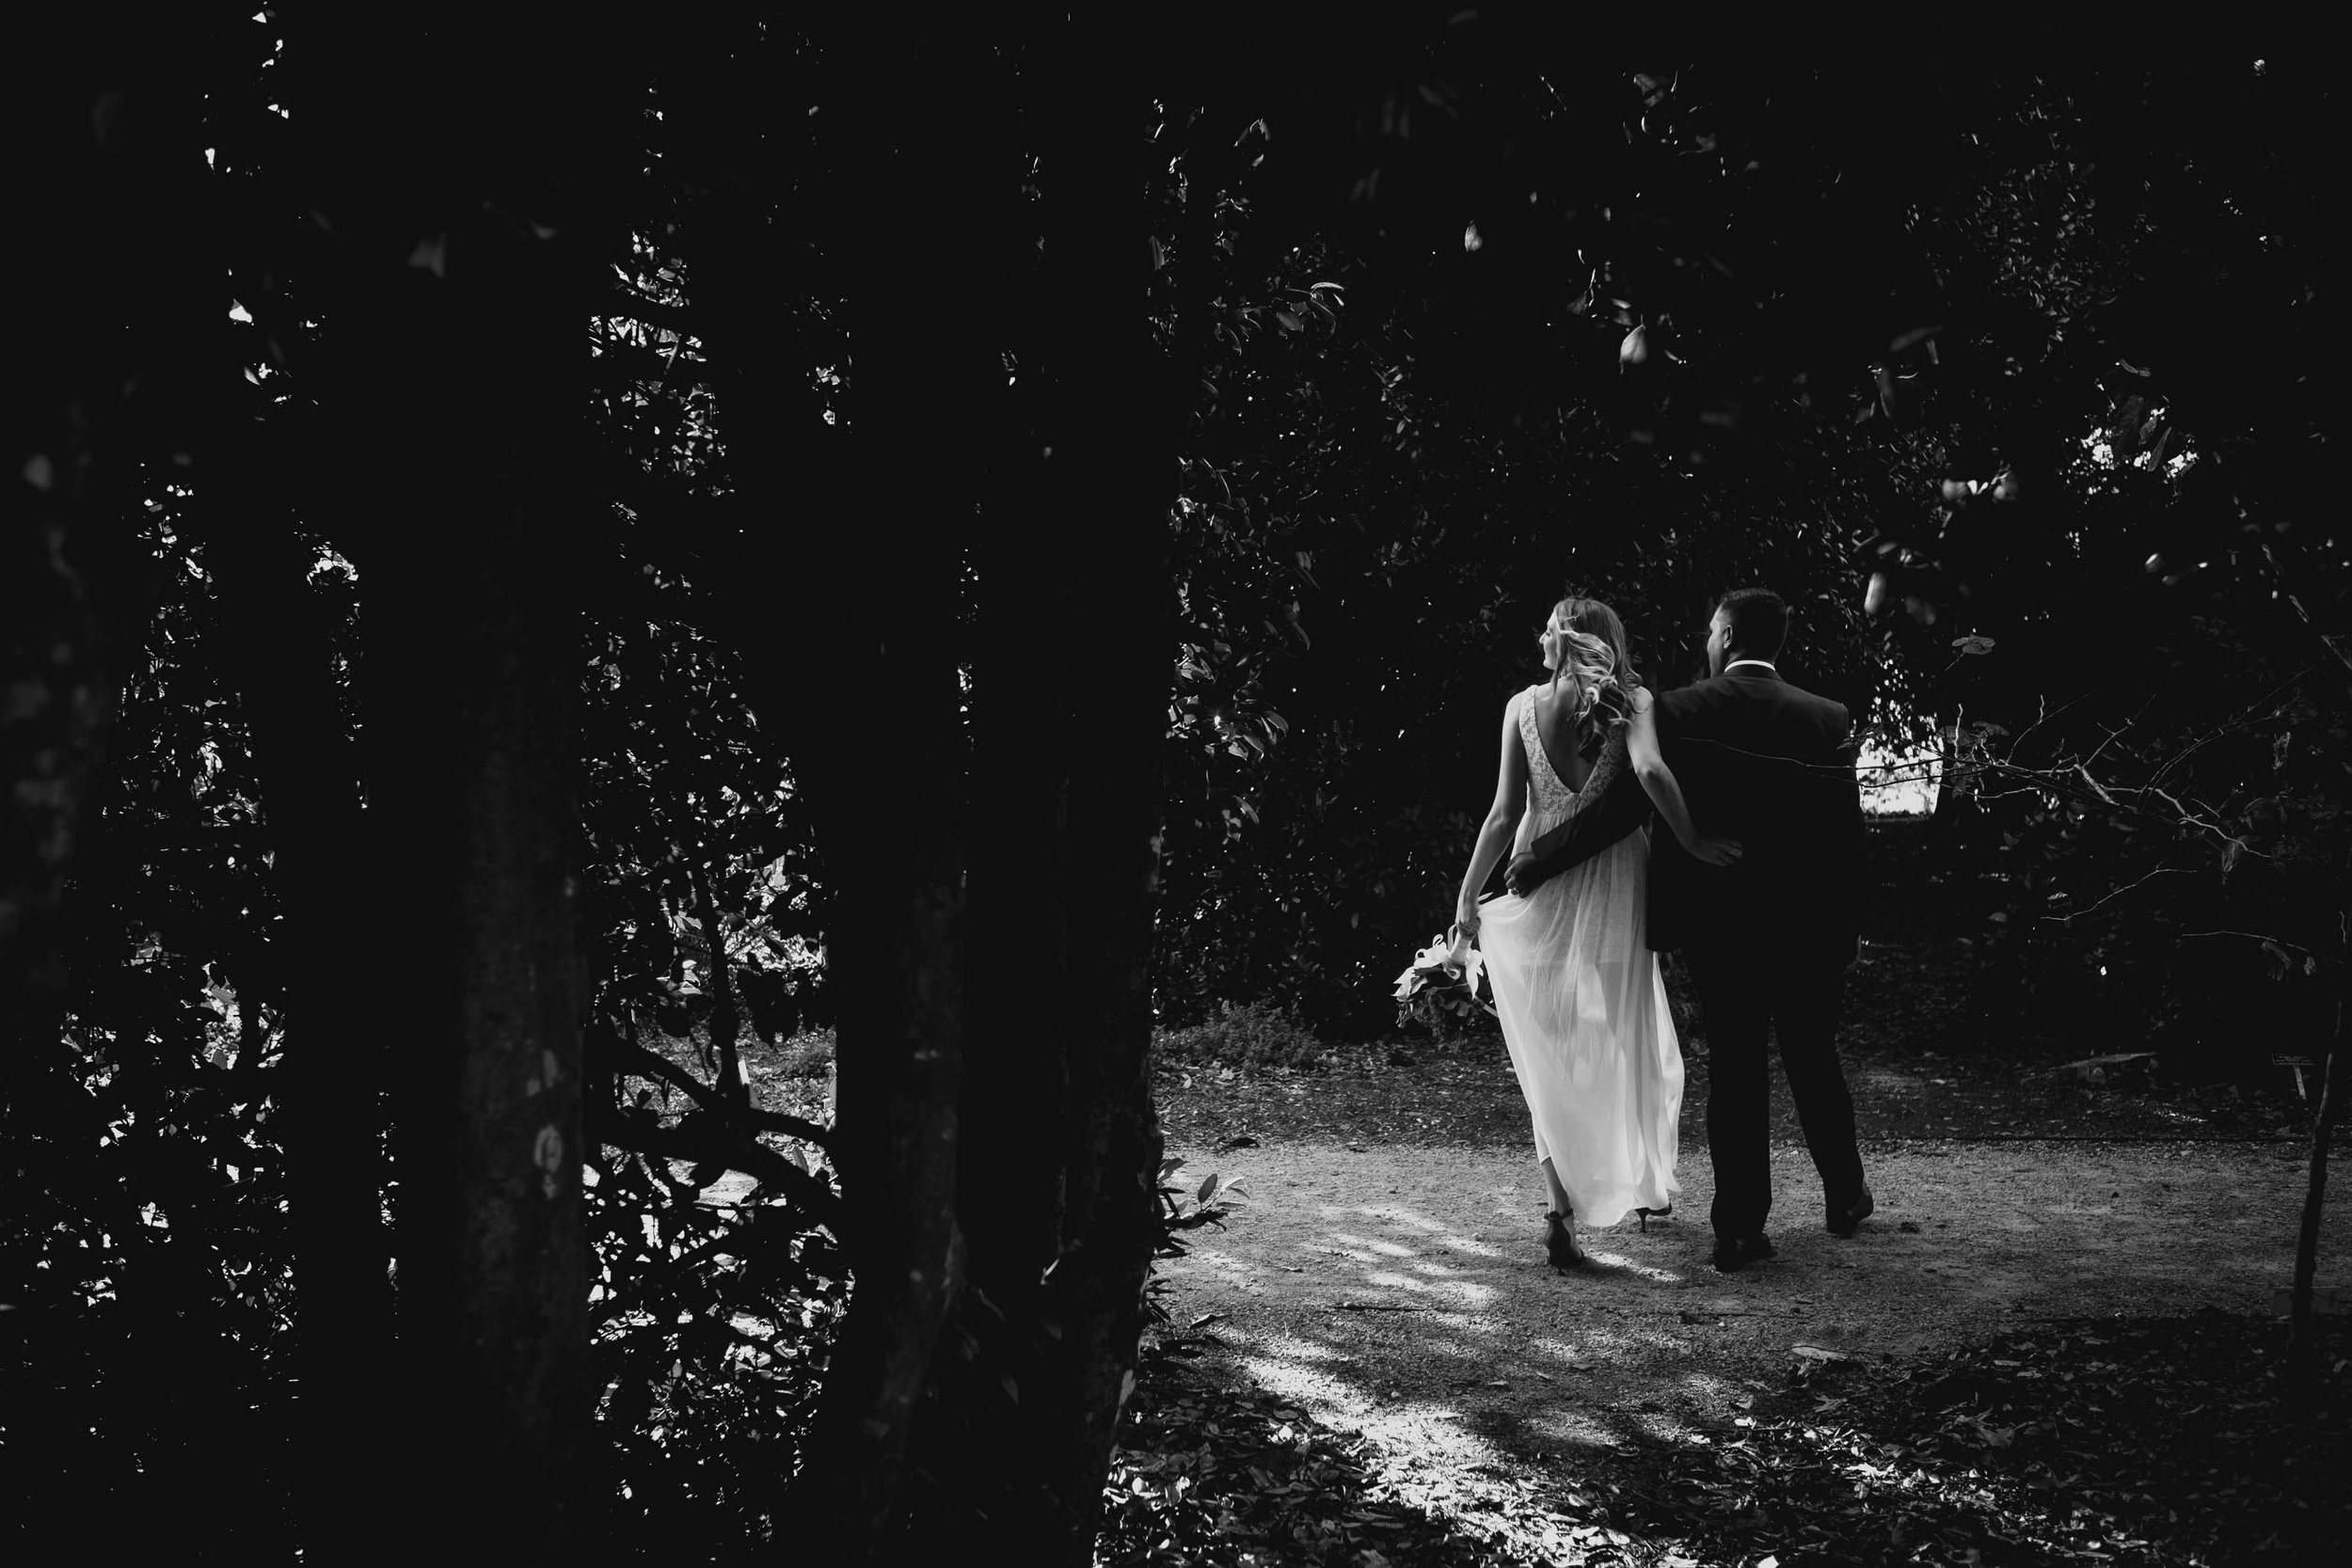 beautiful-jc-raulston-elopement-wedding-photography.jpg